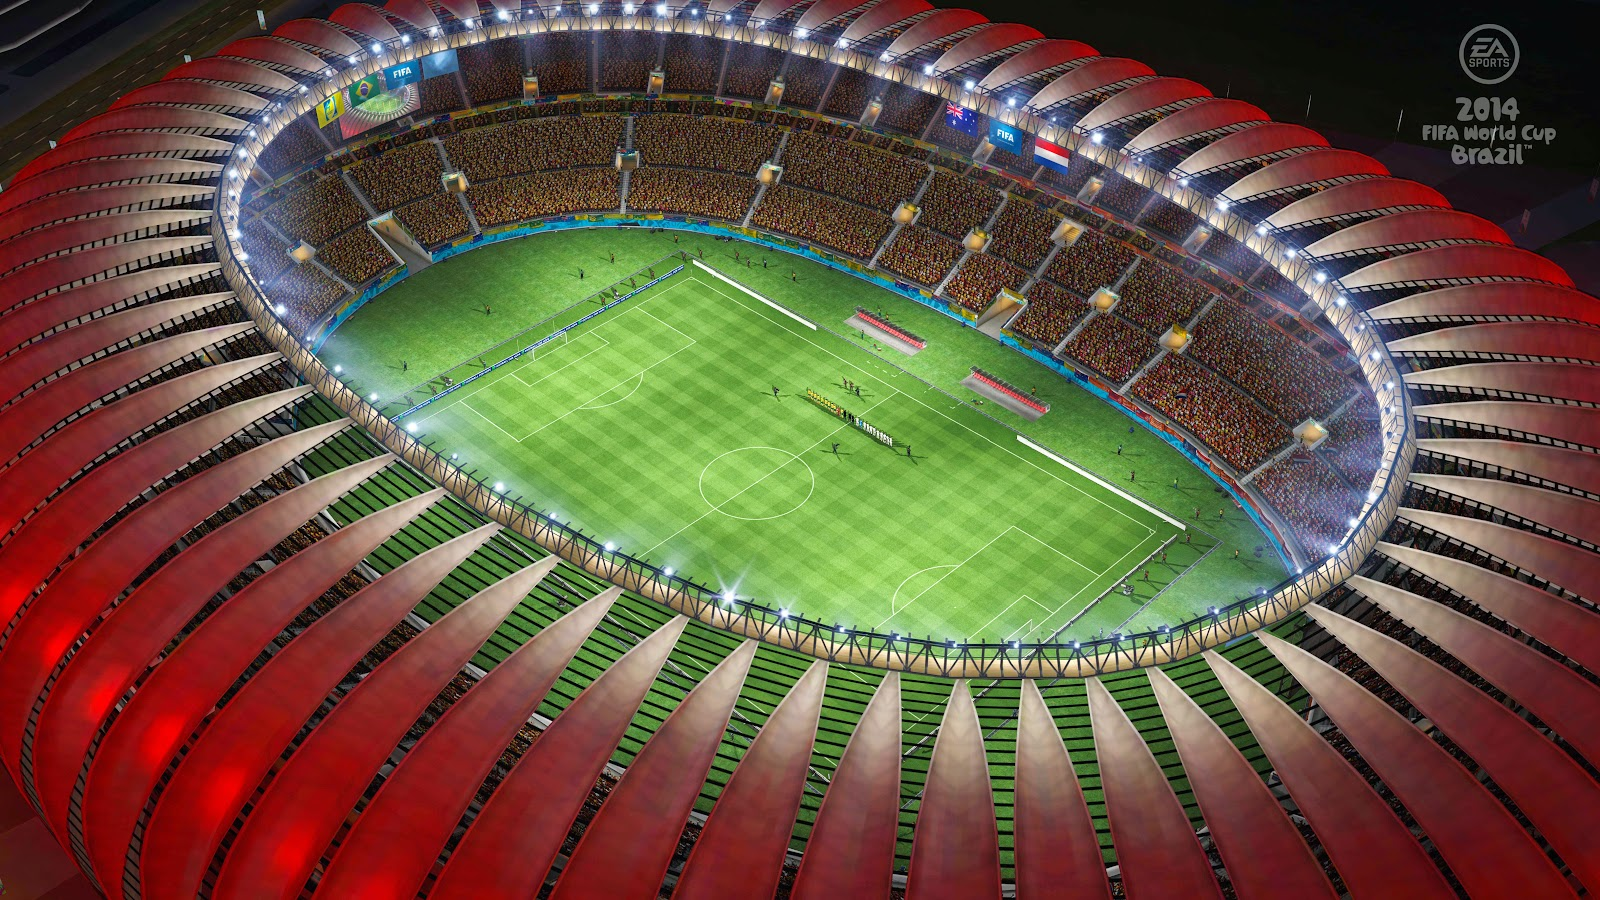 https://2.bp.blogspot.com/-MxiVL7edfMM/U6bvVZkdIjI/AAAAAAAAZ3M/zsm5eegmbhk/s1600/FIFAWorldCup2014_Xbox360_Beira_Rio_HiRes.jpg